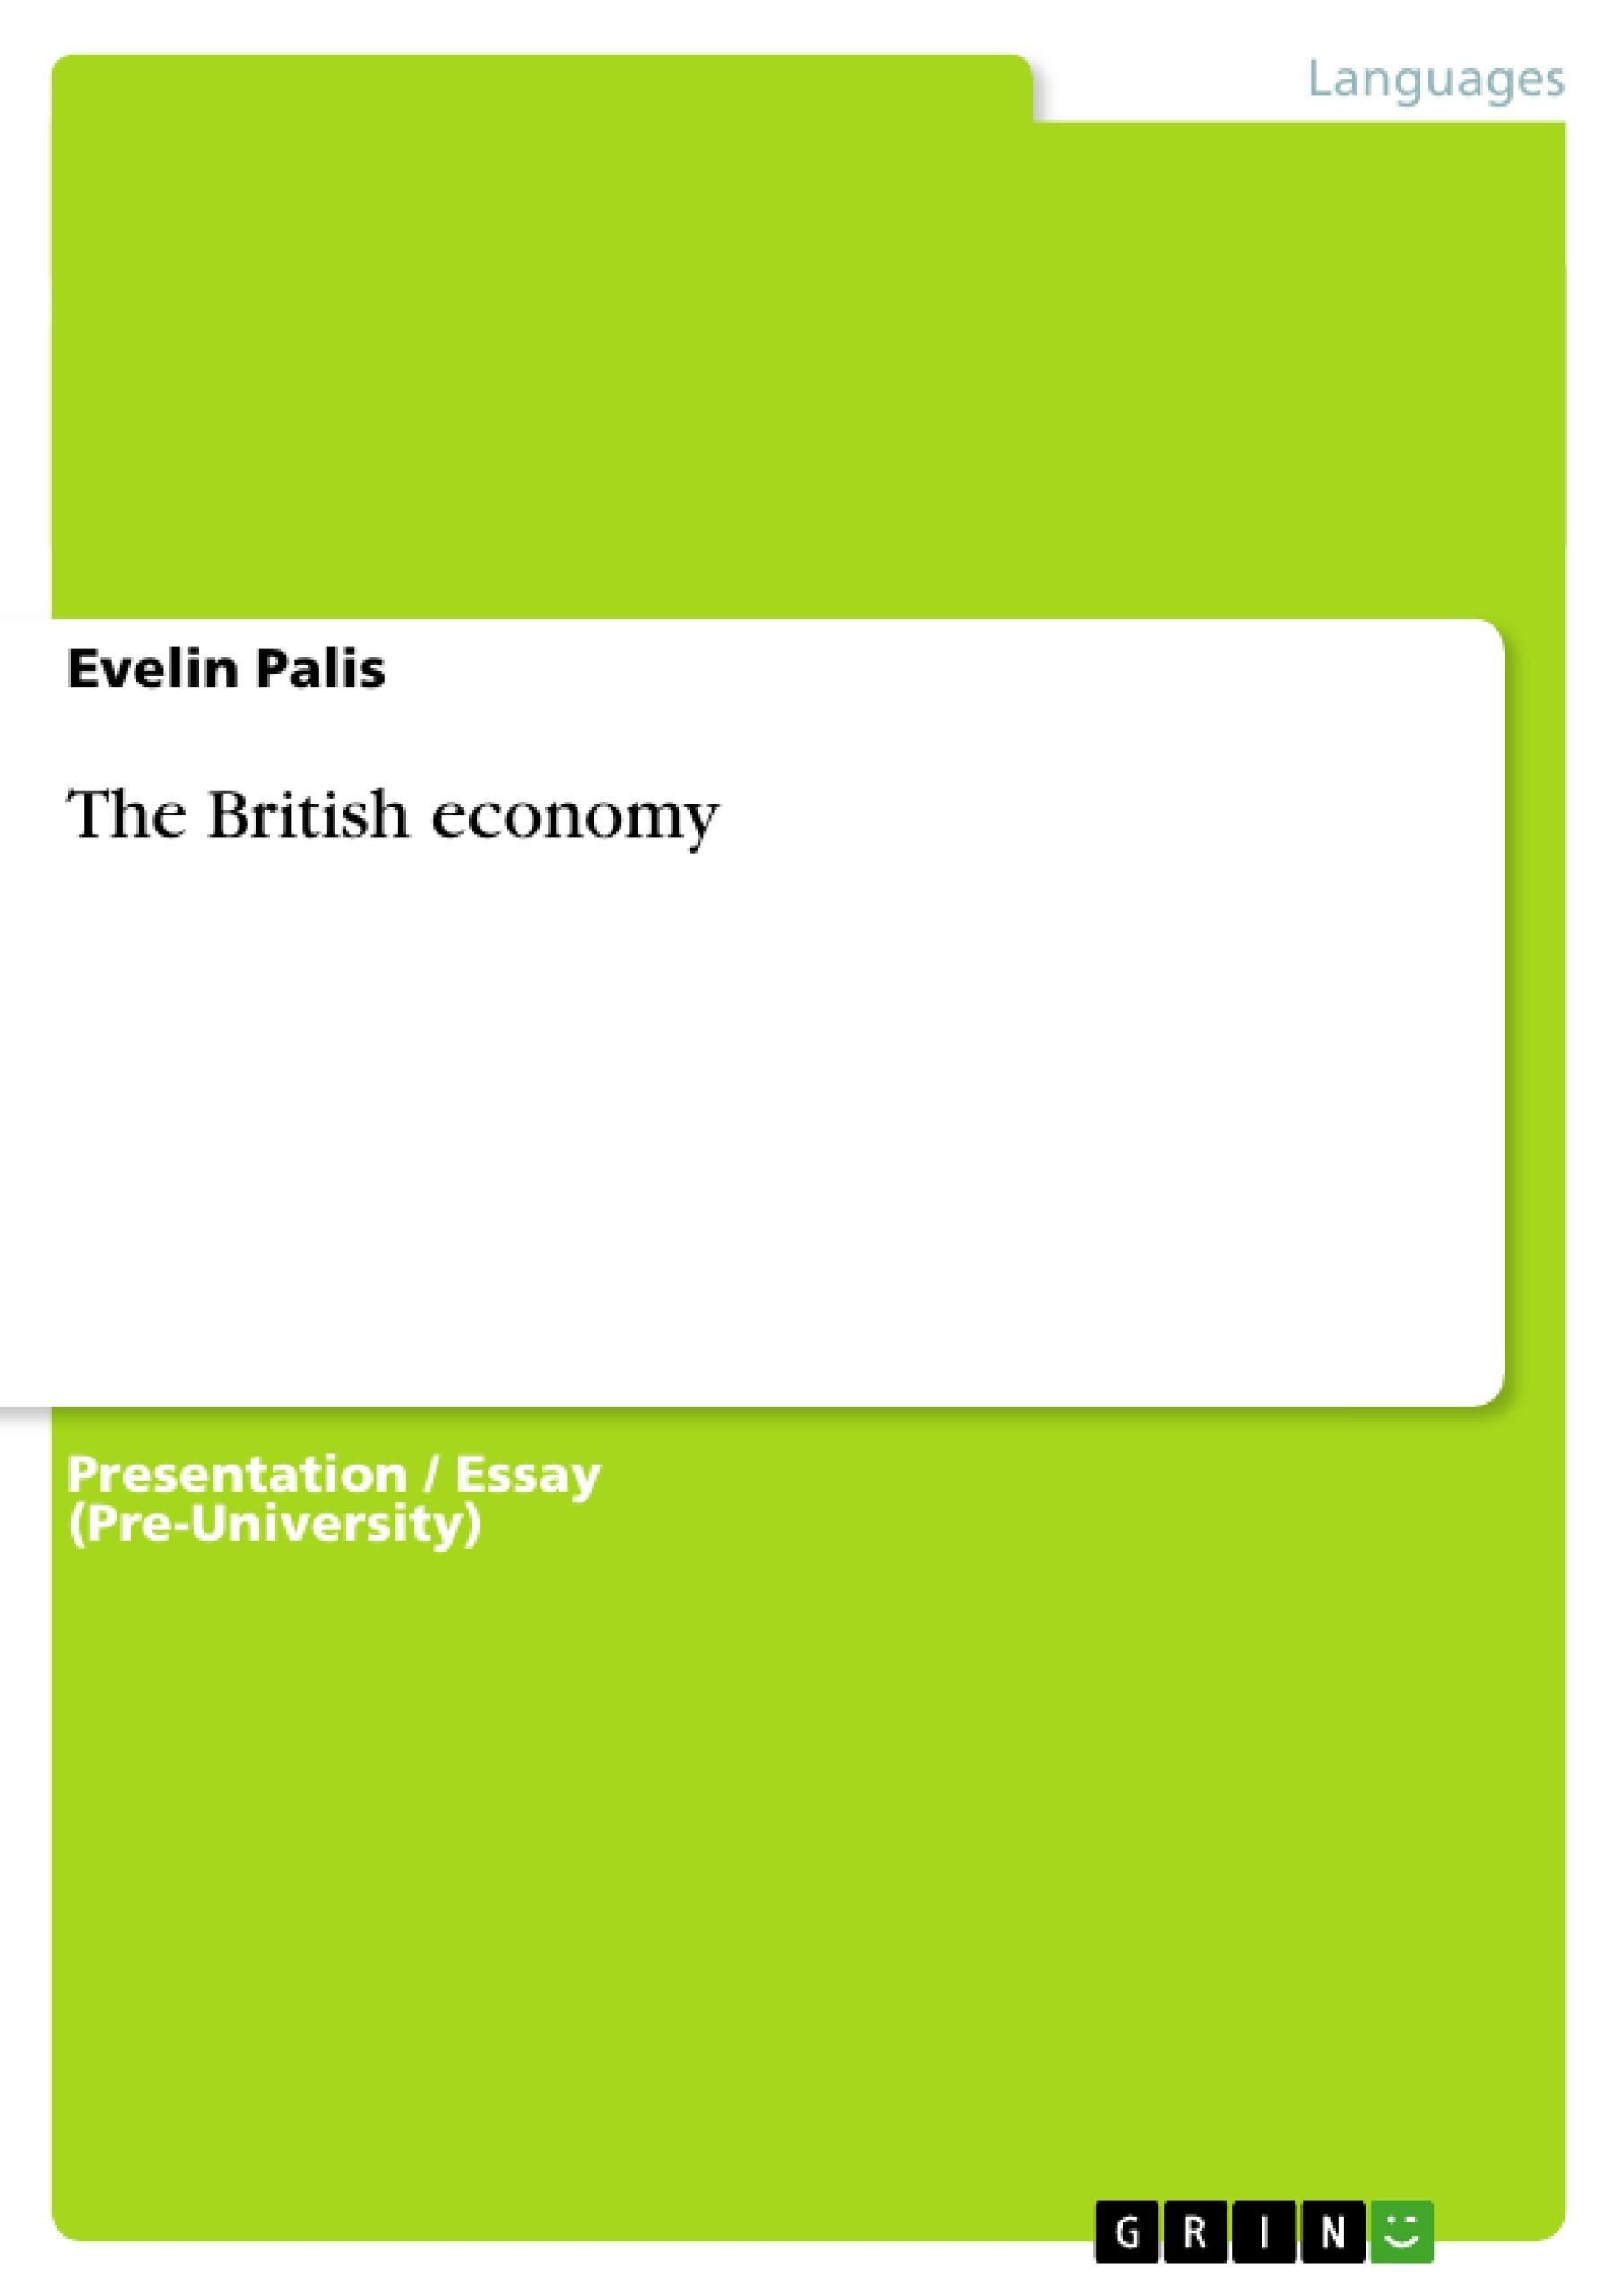 Title: The British economy